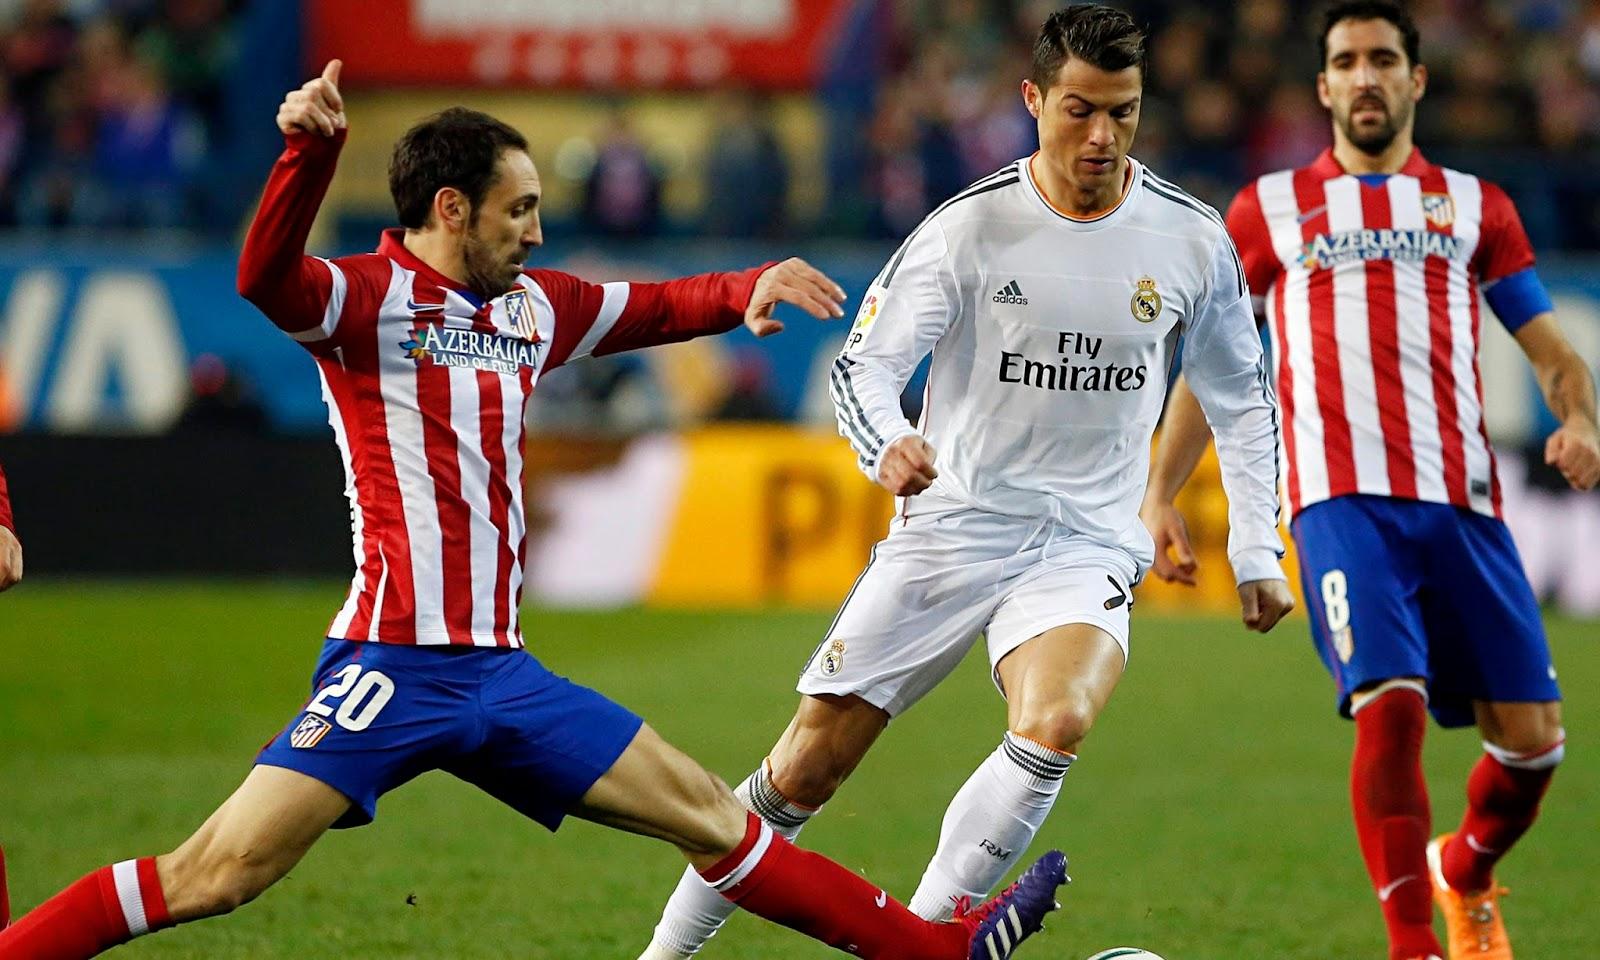 Real Madrid vs Atletico Madrid en vivo